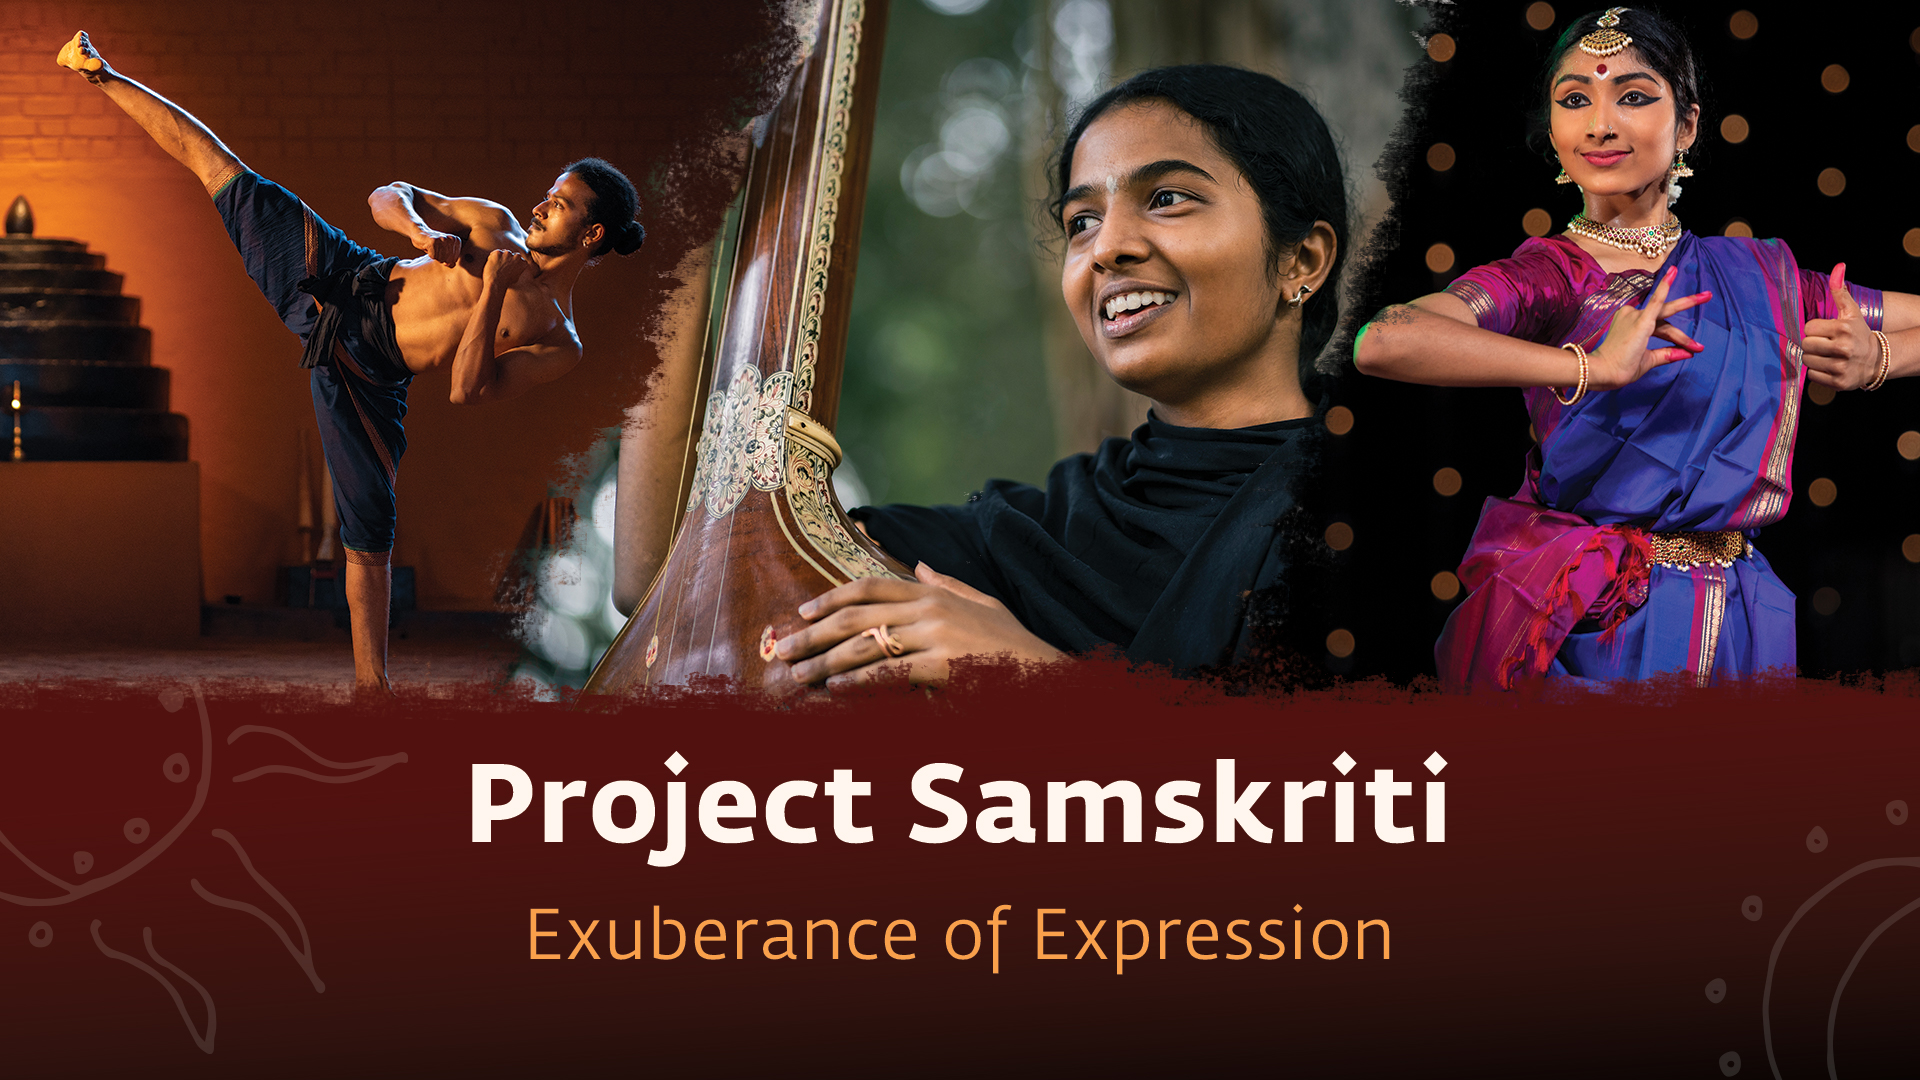 Project Samskriti - Exuberance of Expression